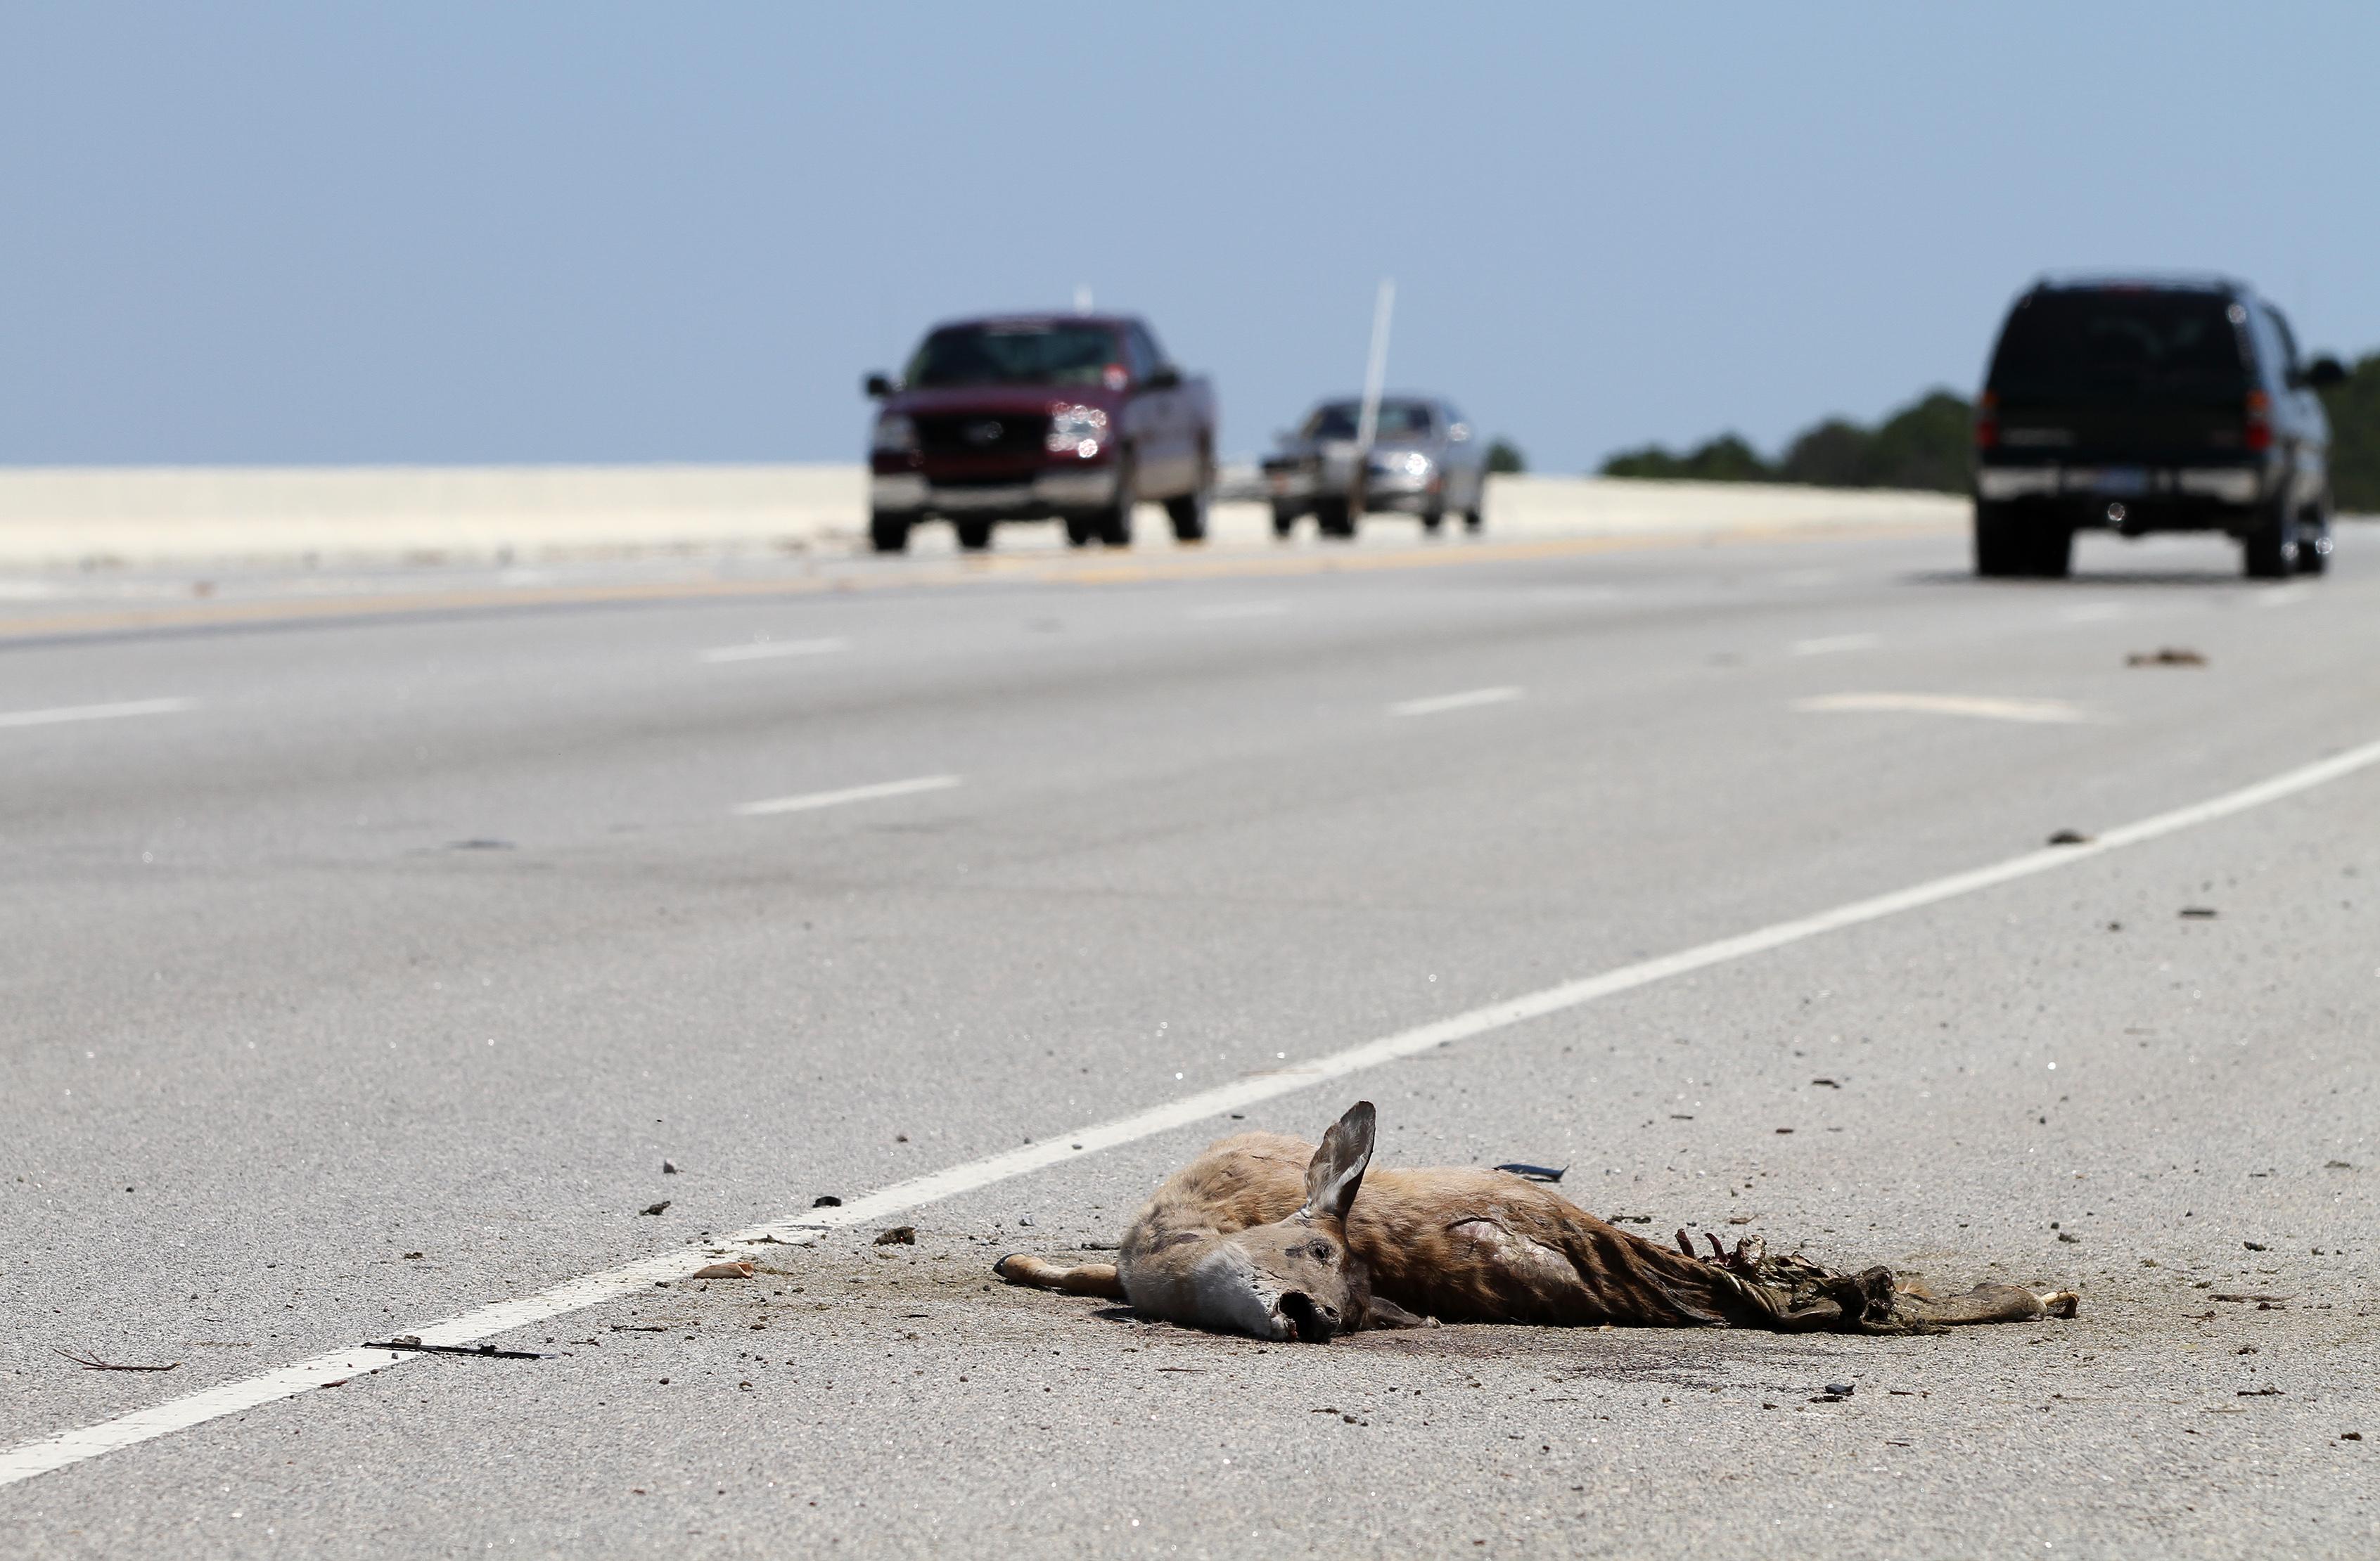 Cat Almost Gets Run Over Highway